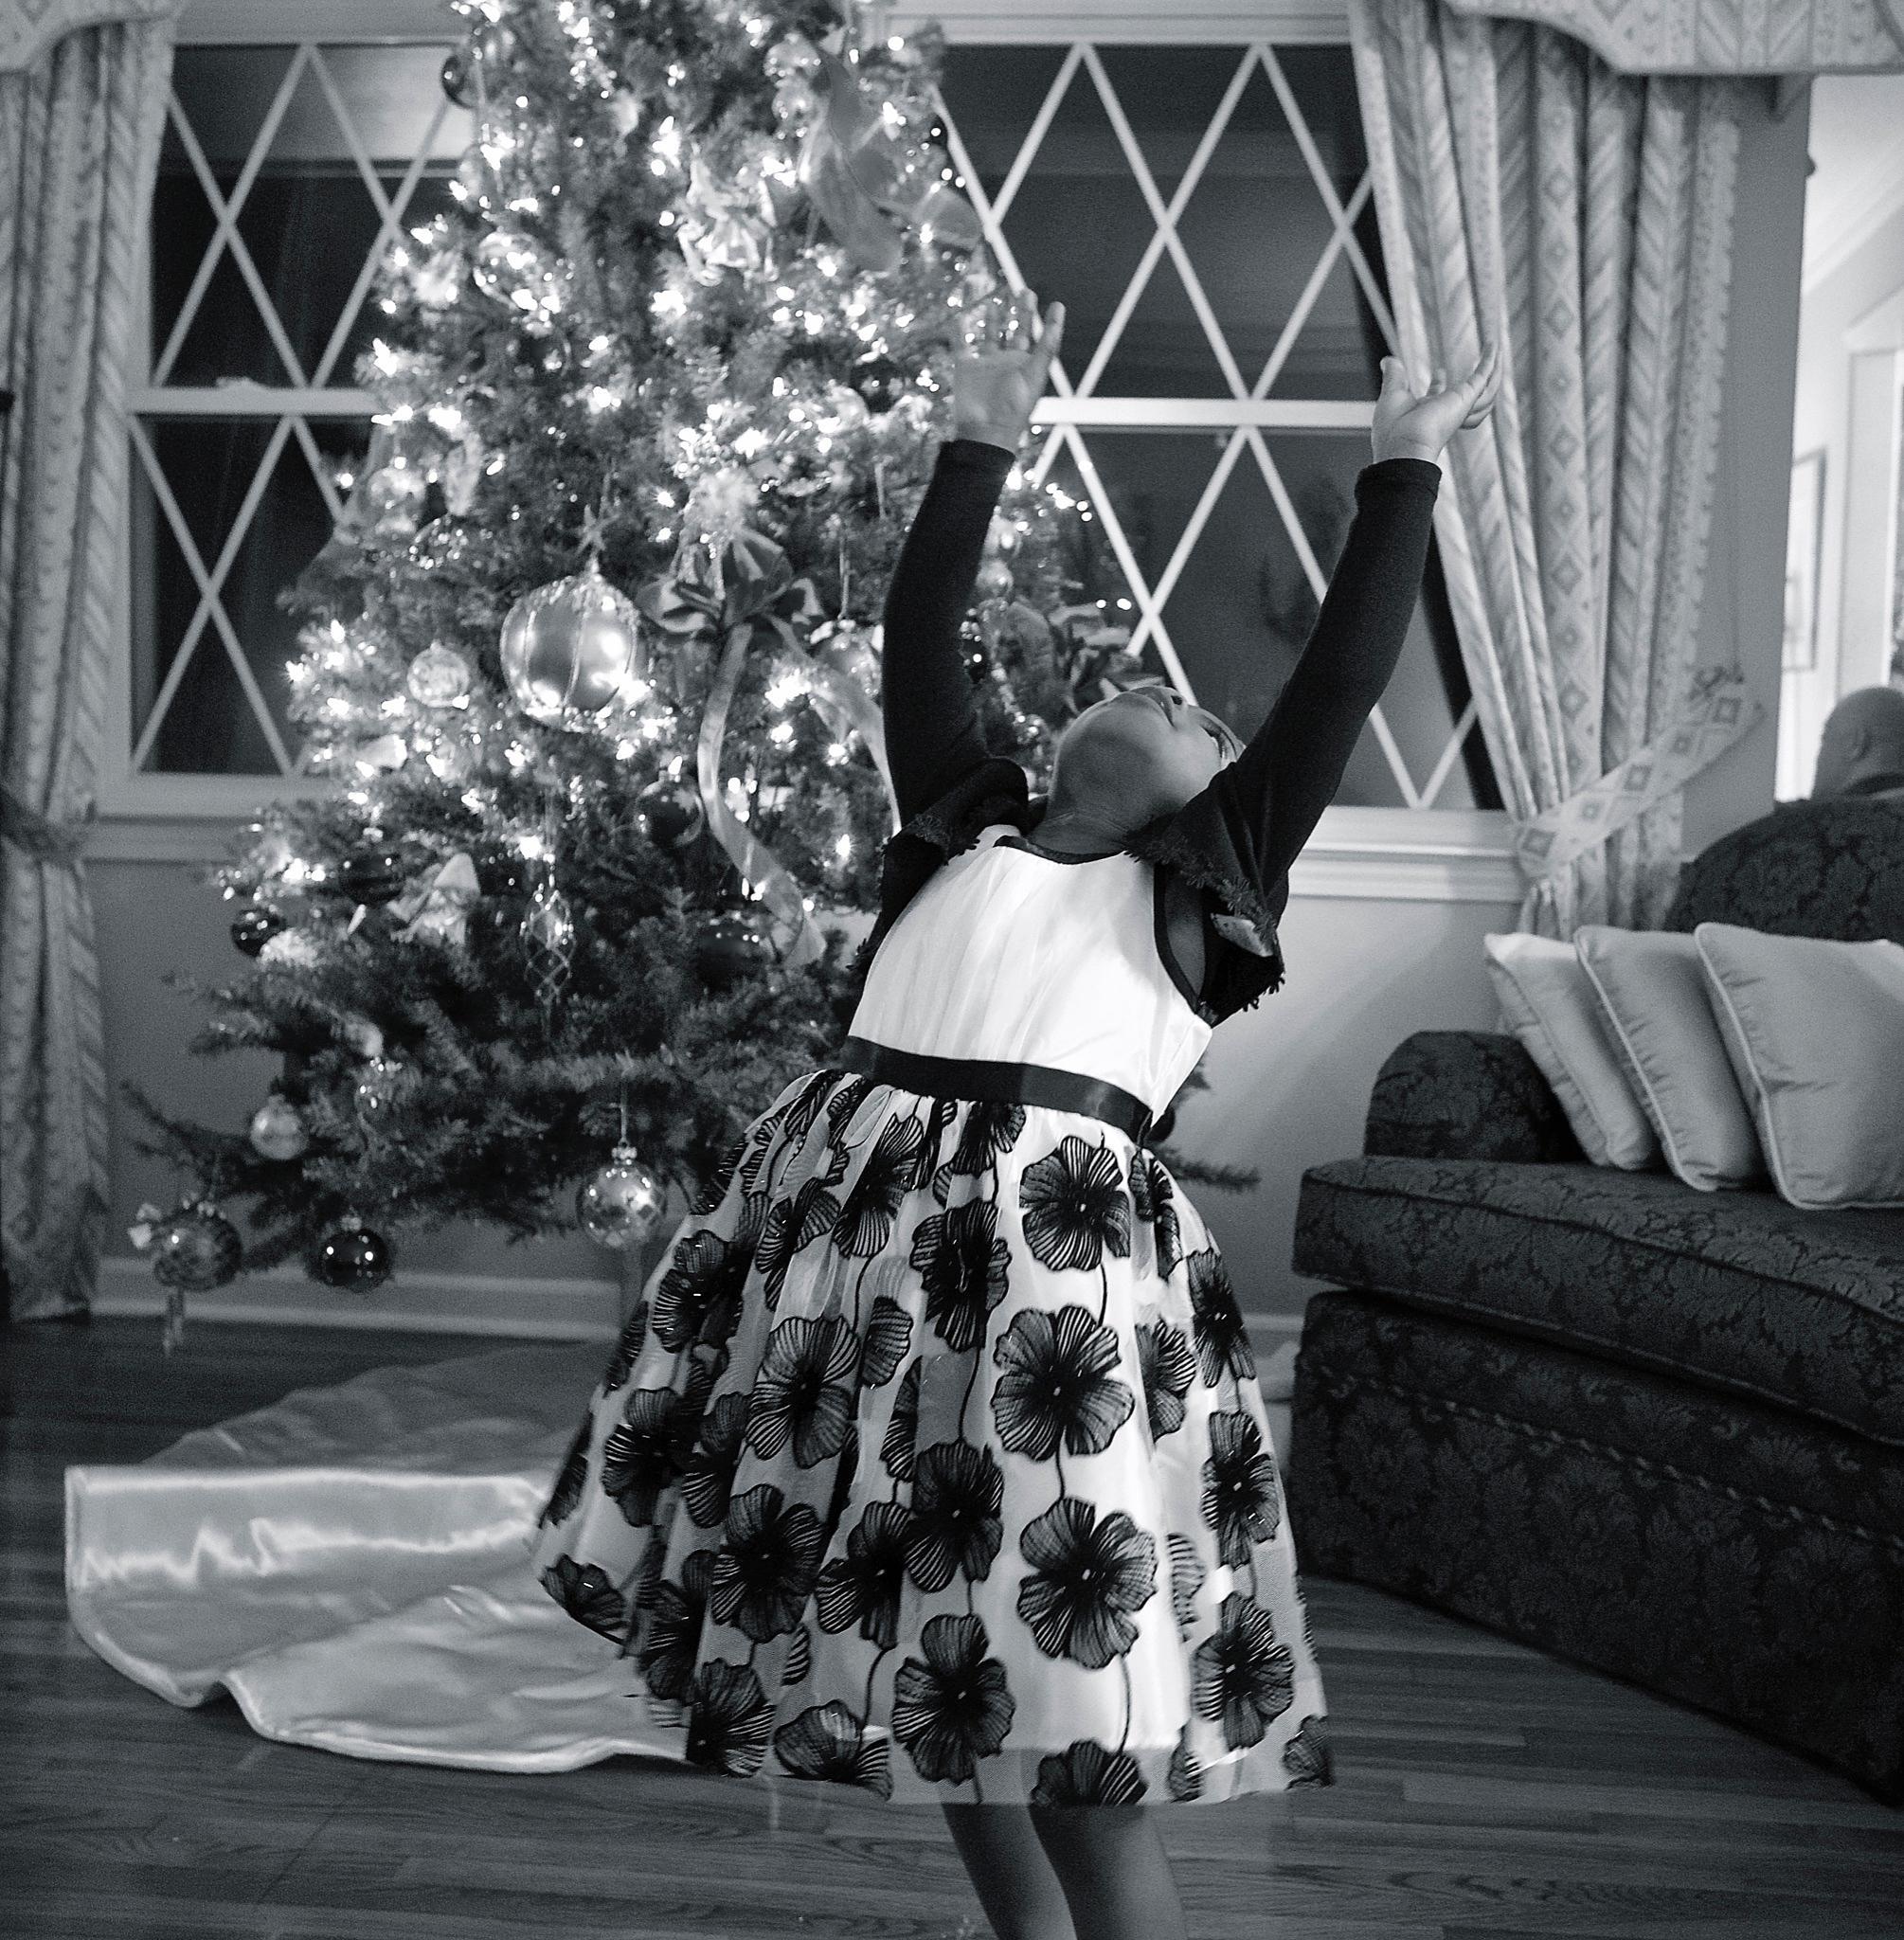 Hallelujah, It Christmas! by wdwbarrett